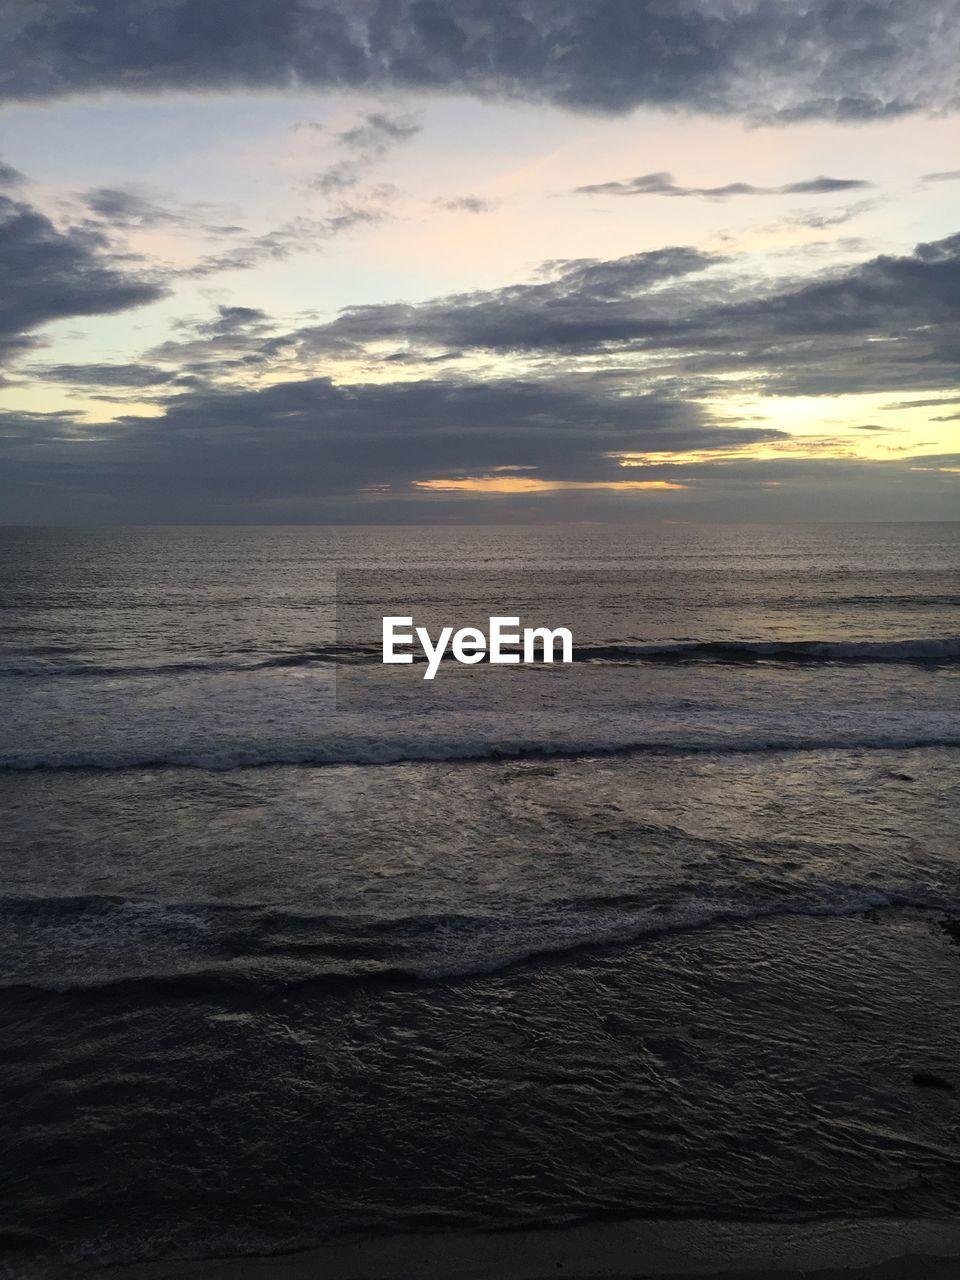 sky, water, sea, cloud - sky, sunset, scenics - nature, horizon, beauty in nature, horizon over water, tranquility, tranquil scene, nature, idyllic, no people, waterfront, non-urban scene, outdoors, beach, land